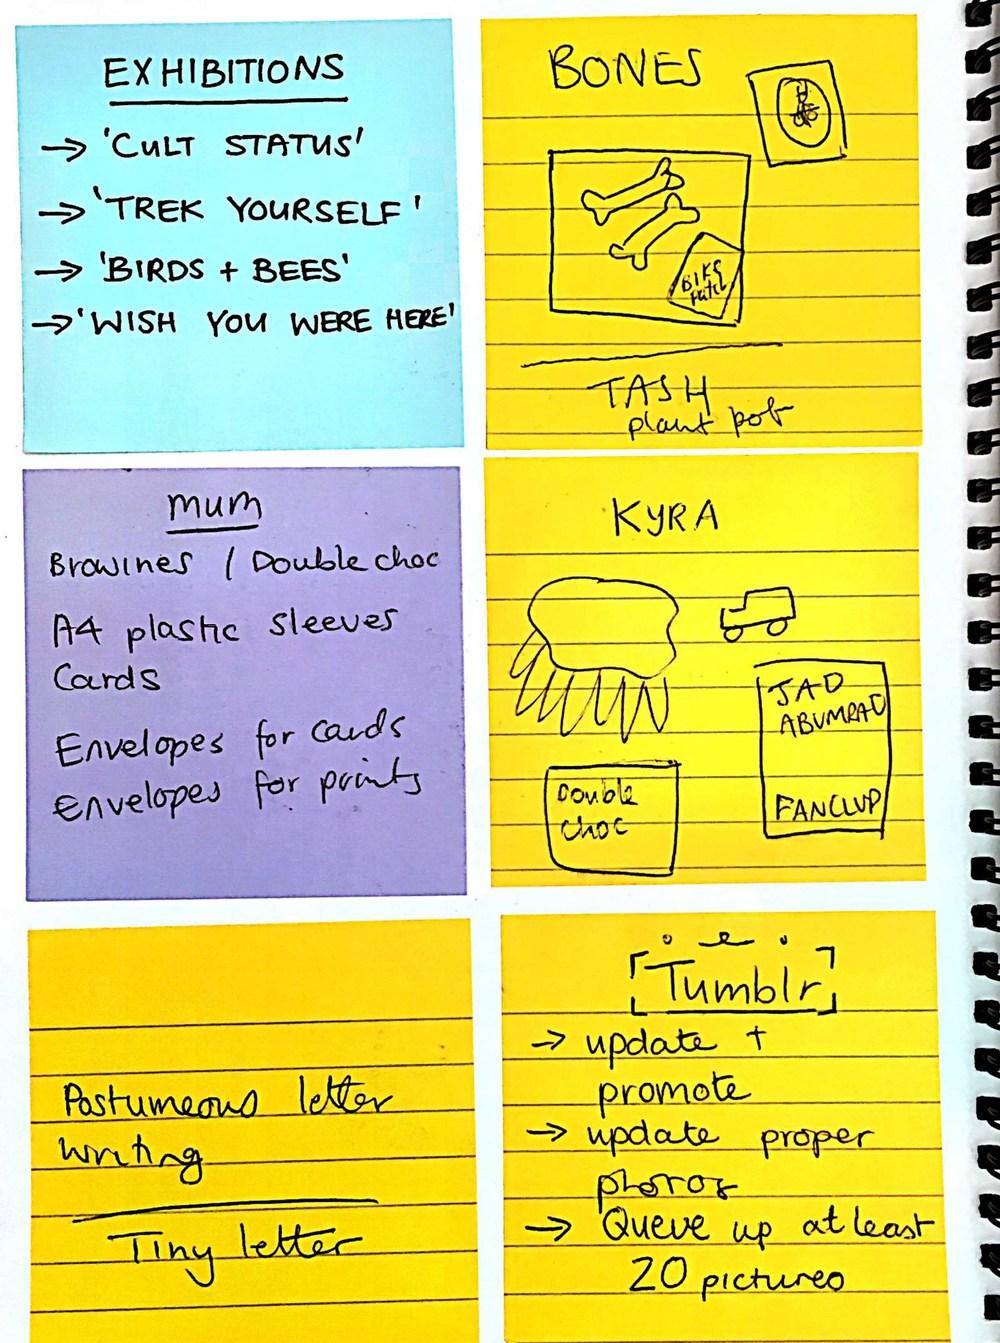 Post it notes 3.jpg